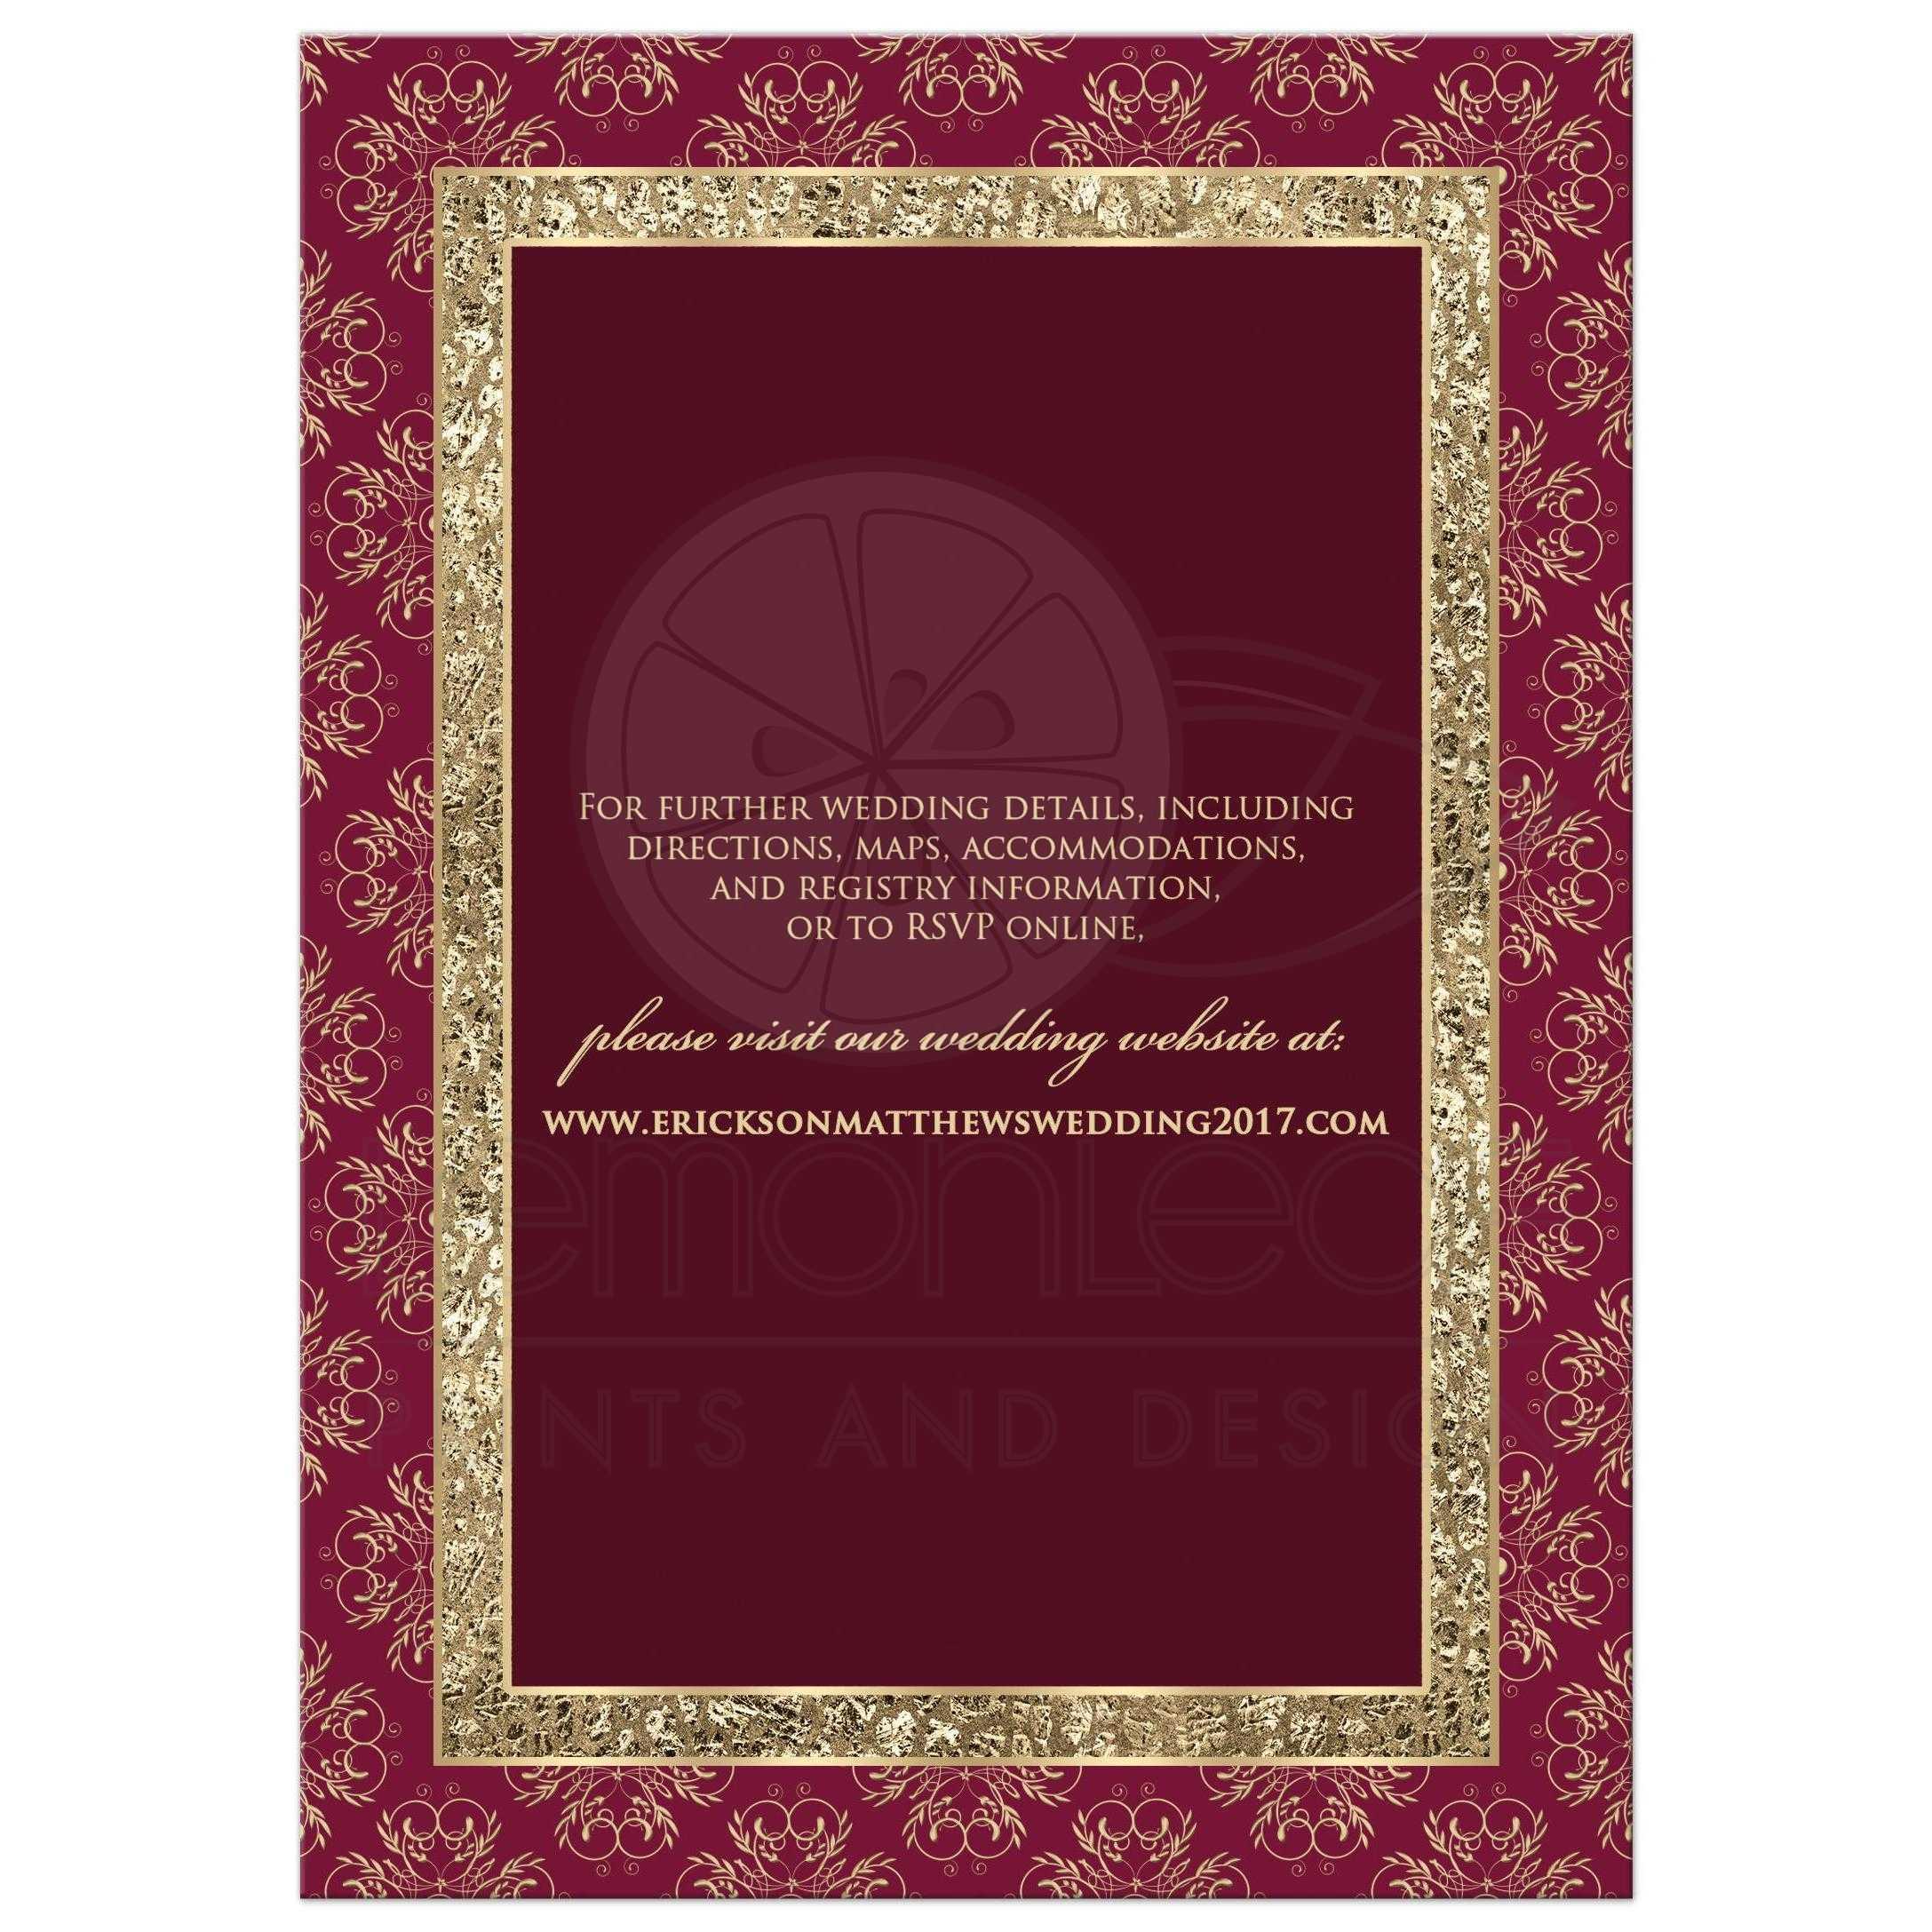 Wedding Invitation | Burgundy, Gold Elegance | Monogram